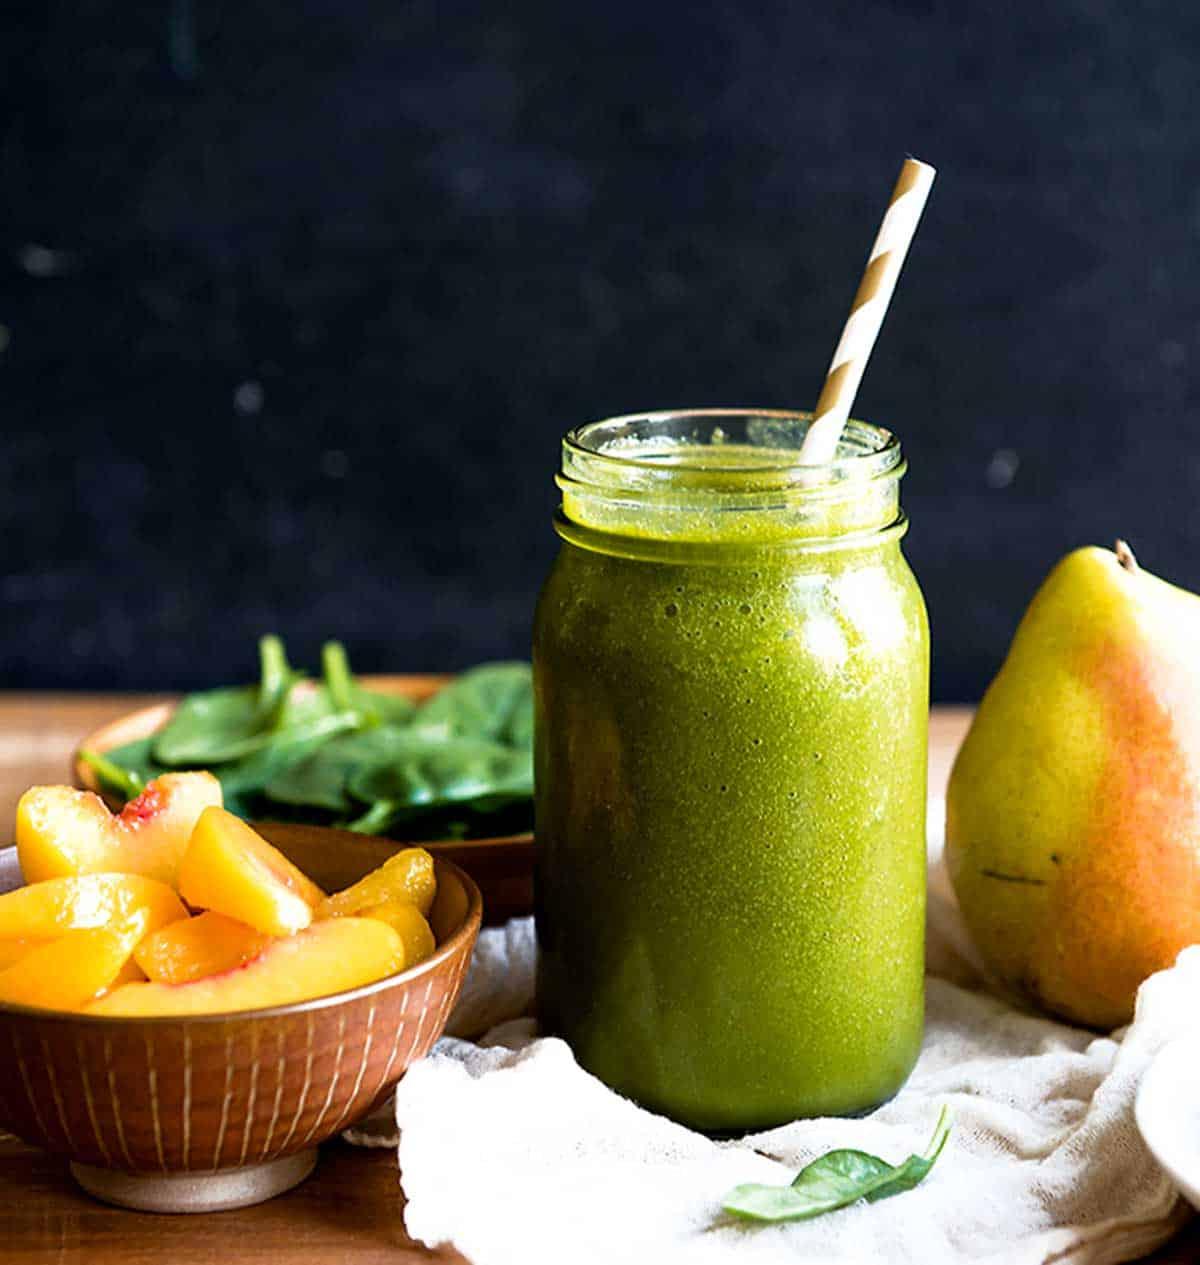 Pear smoothie recipe